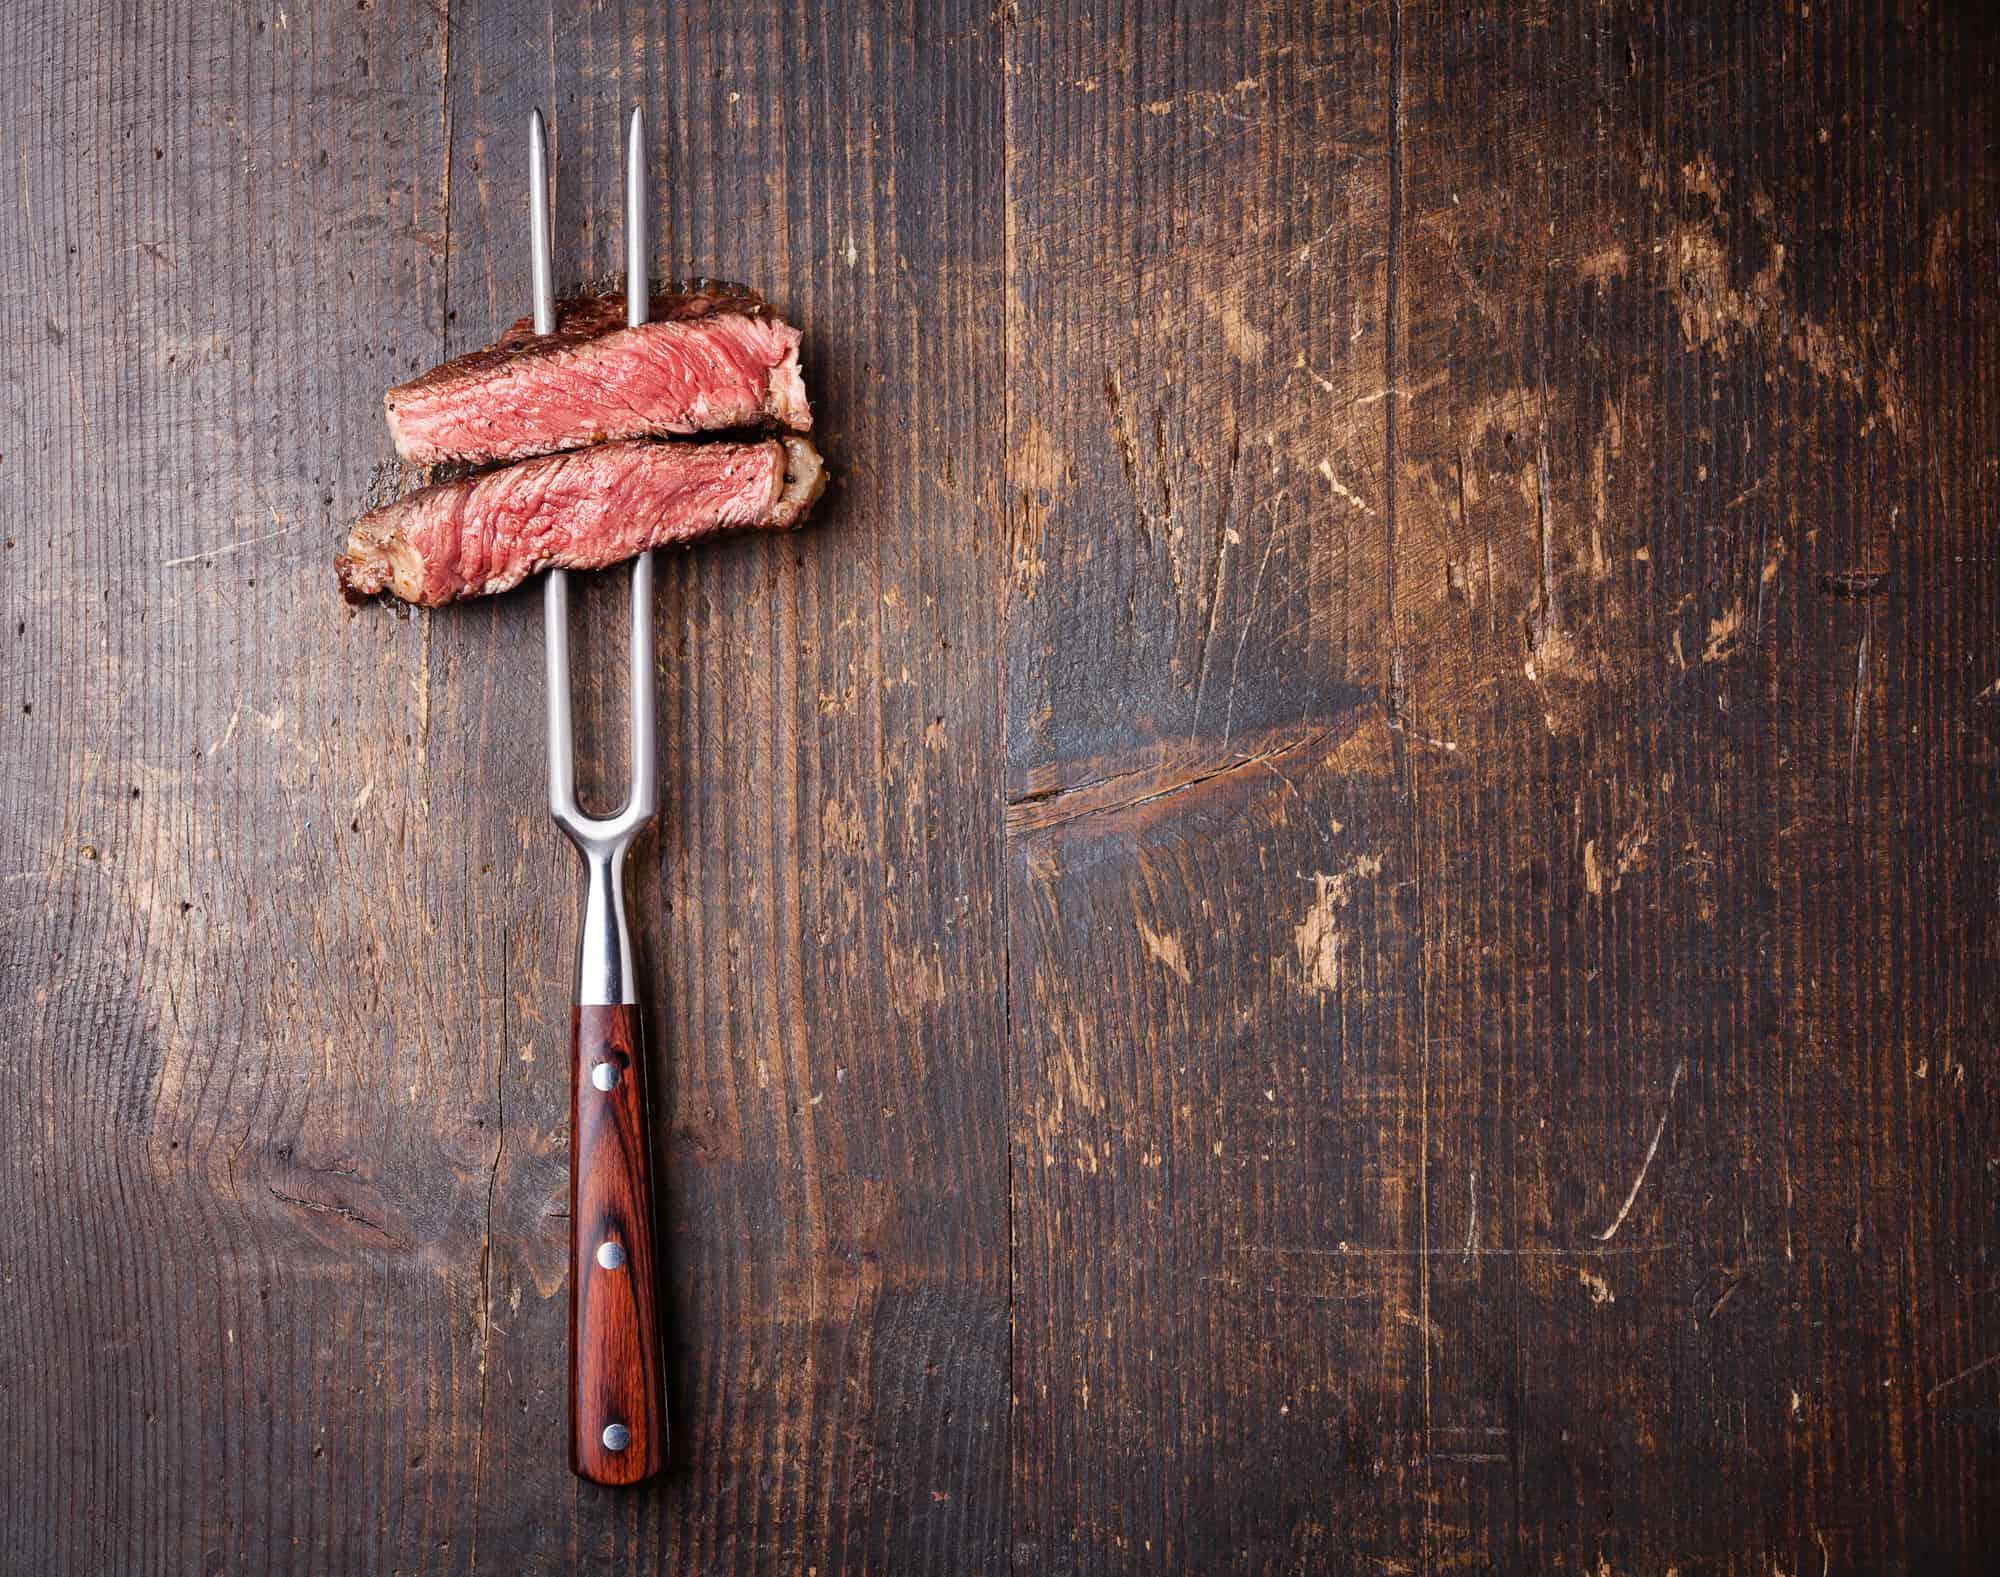 Slices of beef steak on meat fork on dark on wood